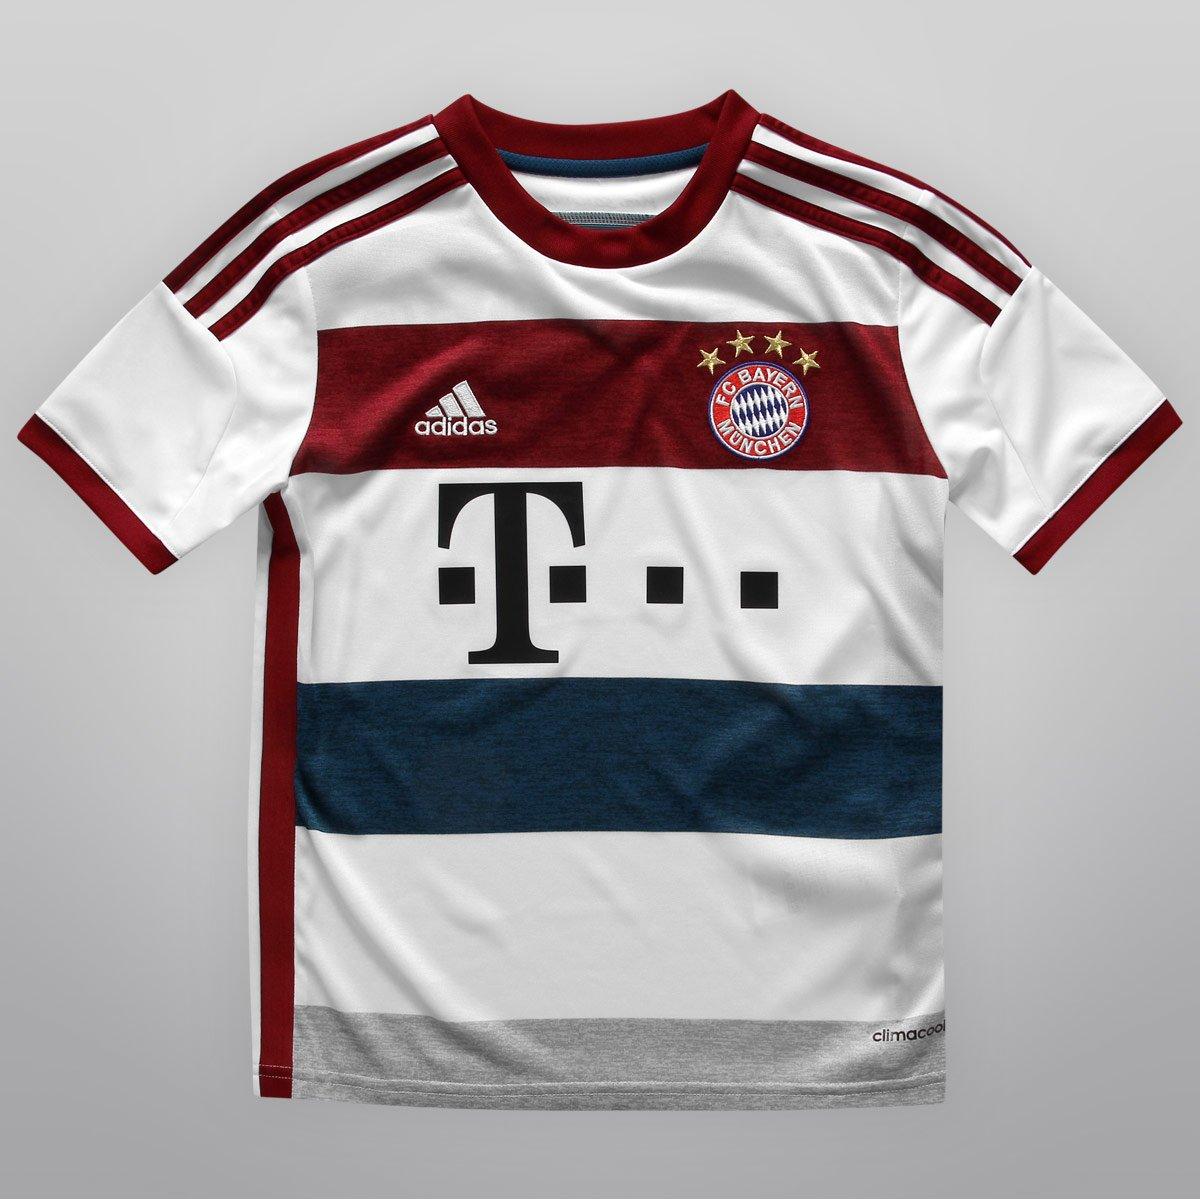 Camisa Adidas Bayern de Munique Away 14 15 s n° Juvenil - Compre Agora  94abc84947f1d